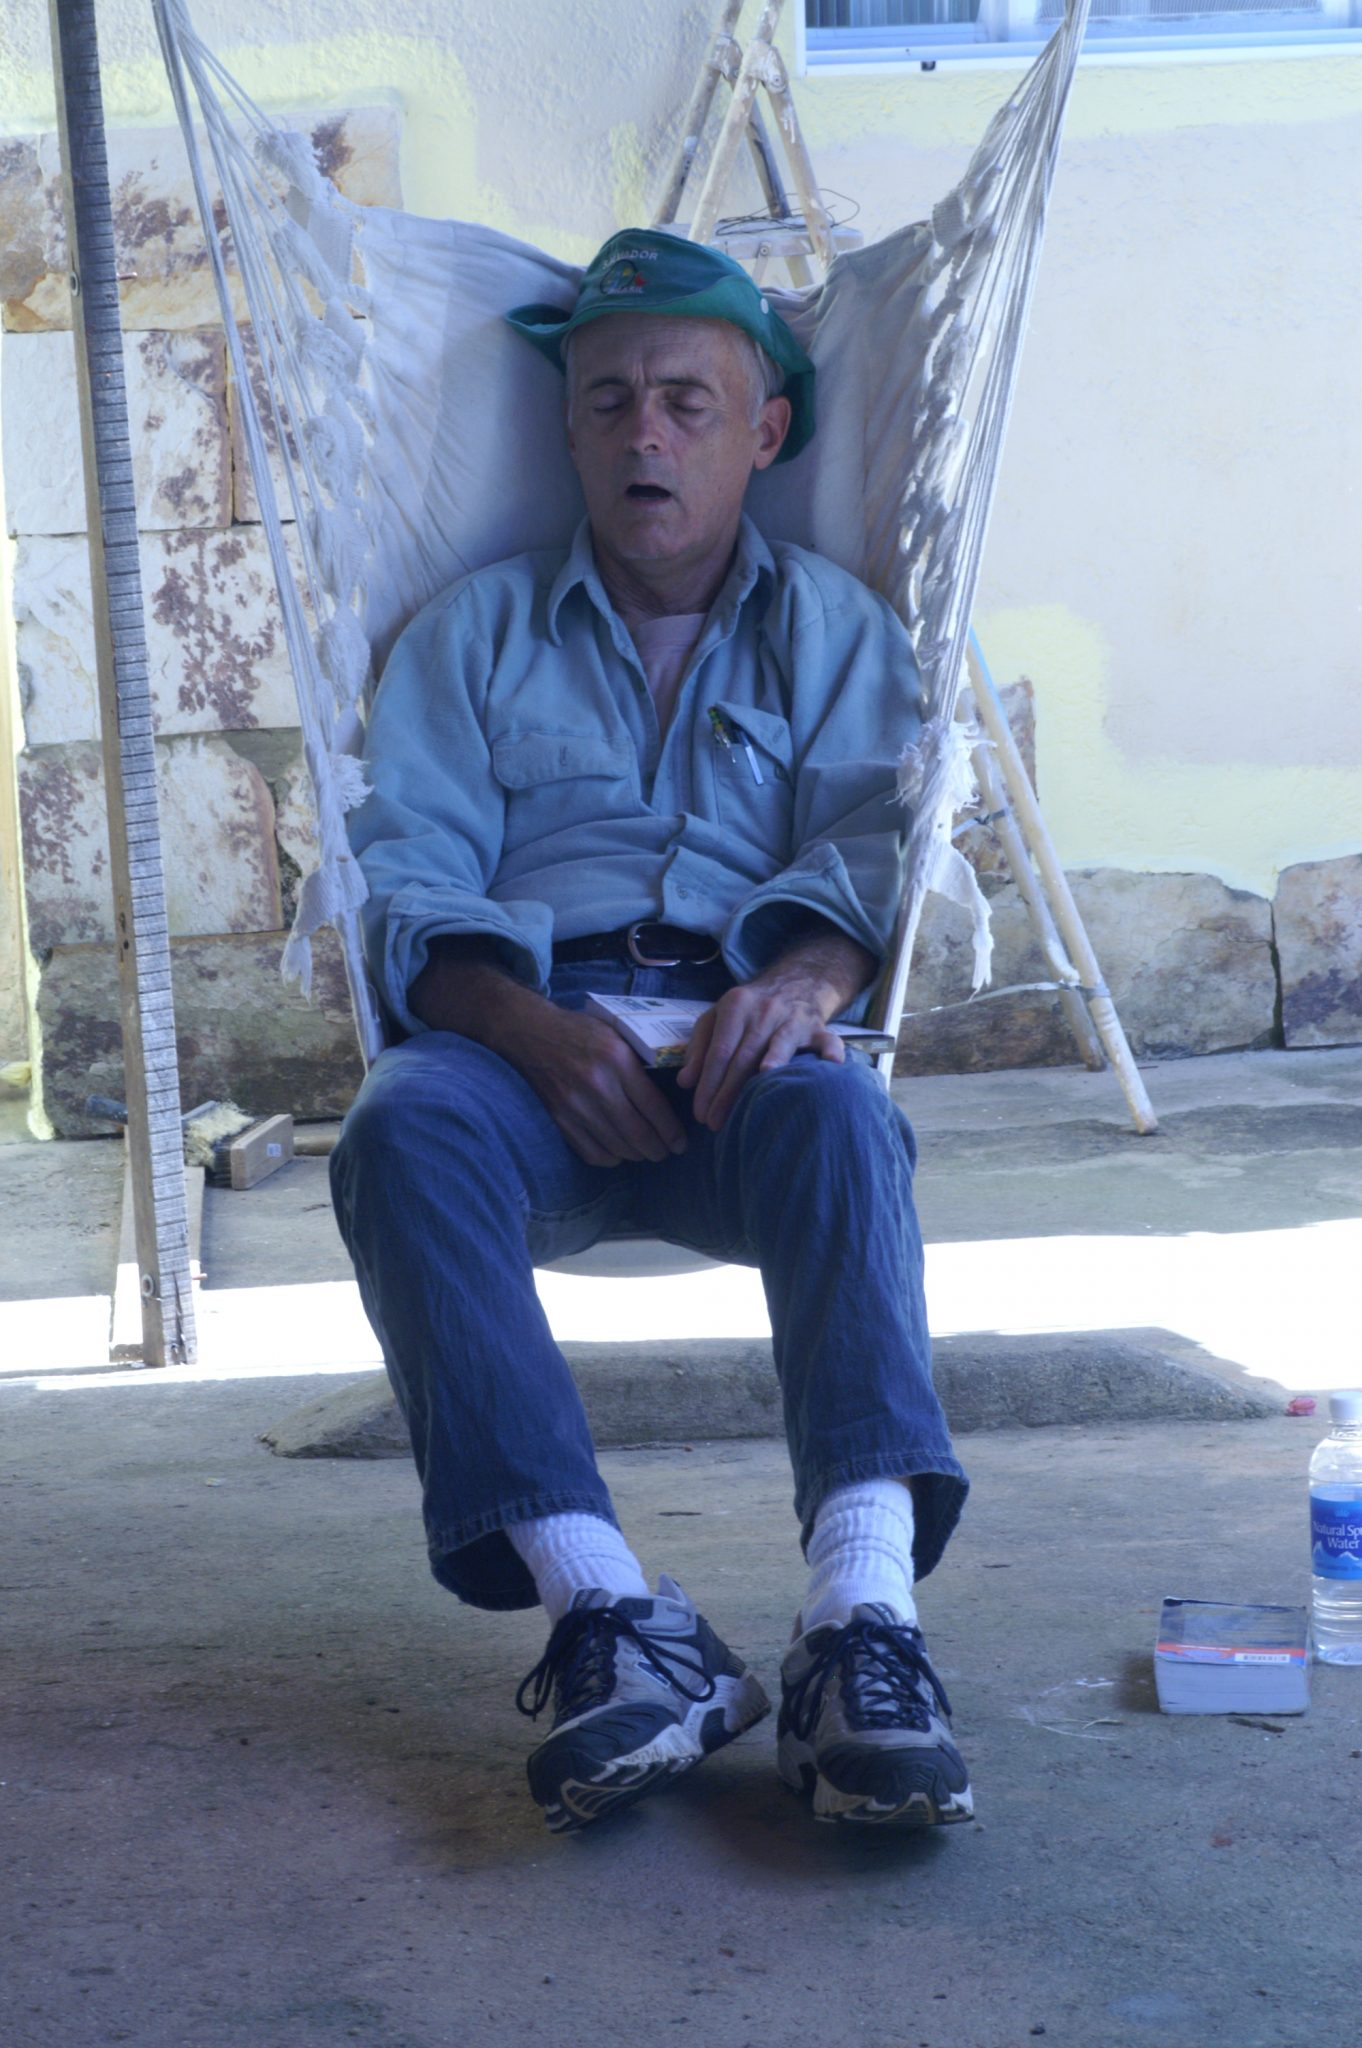 Man sleeping in hammock chair